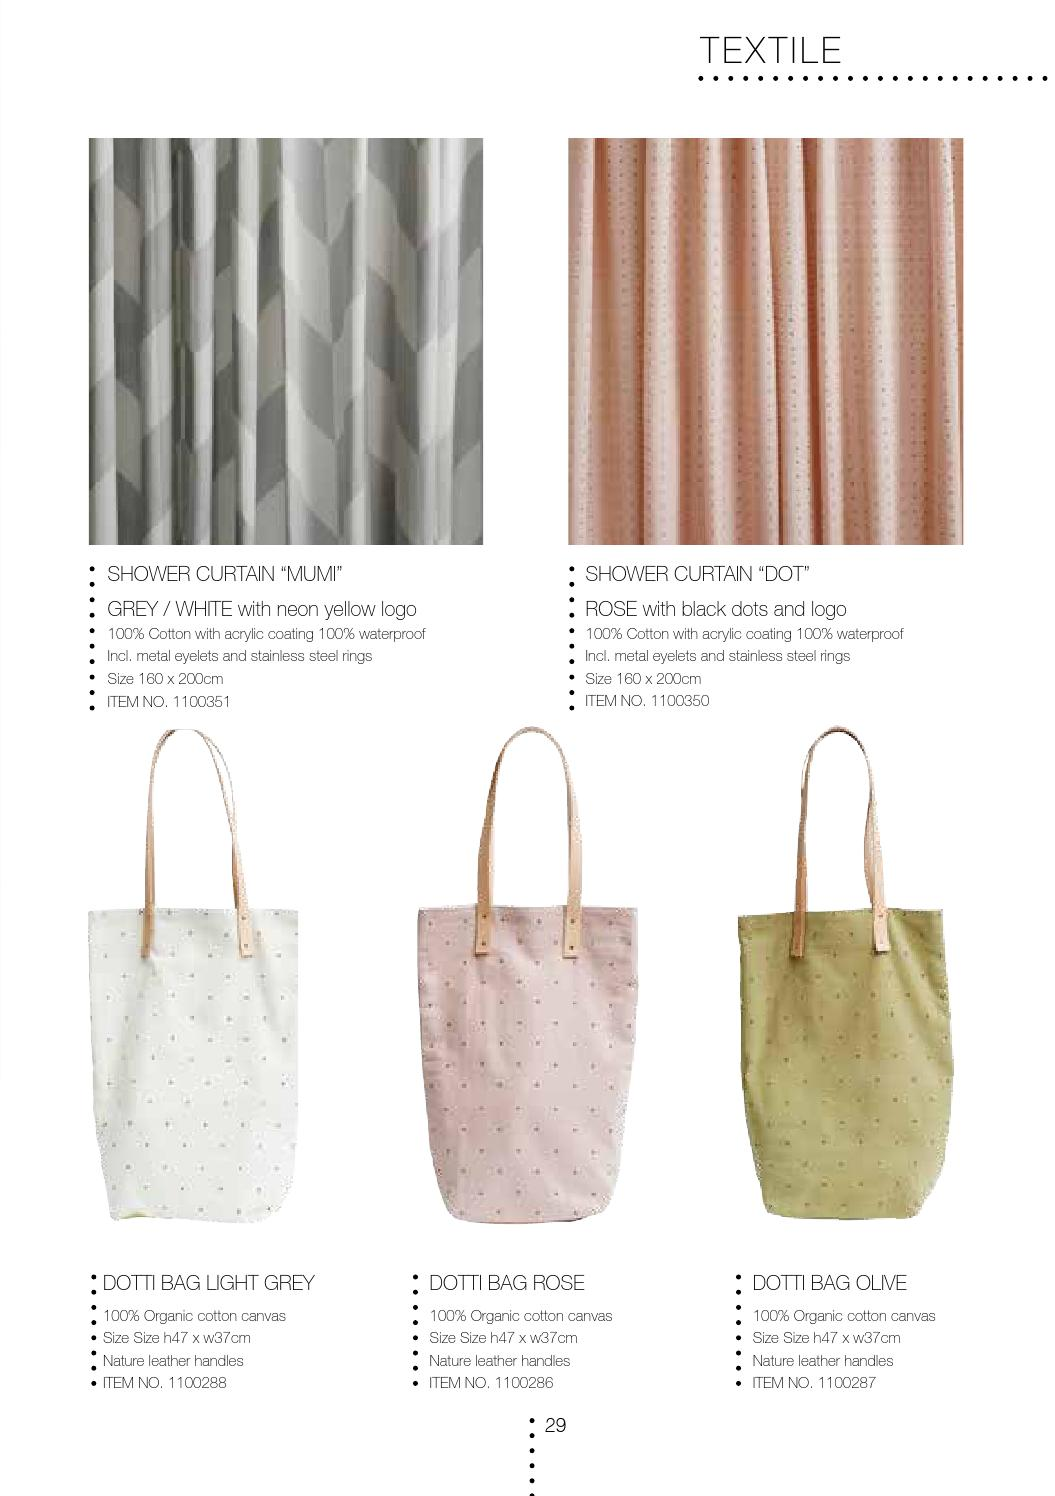 Oyoy Living Design Ss14 Catalogue By Oyoy Living Design Issuu